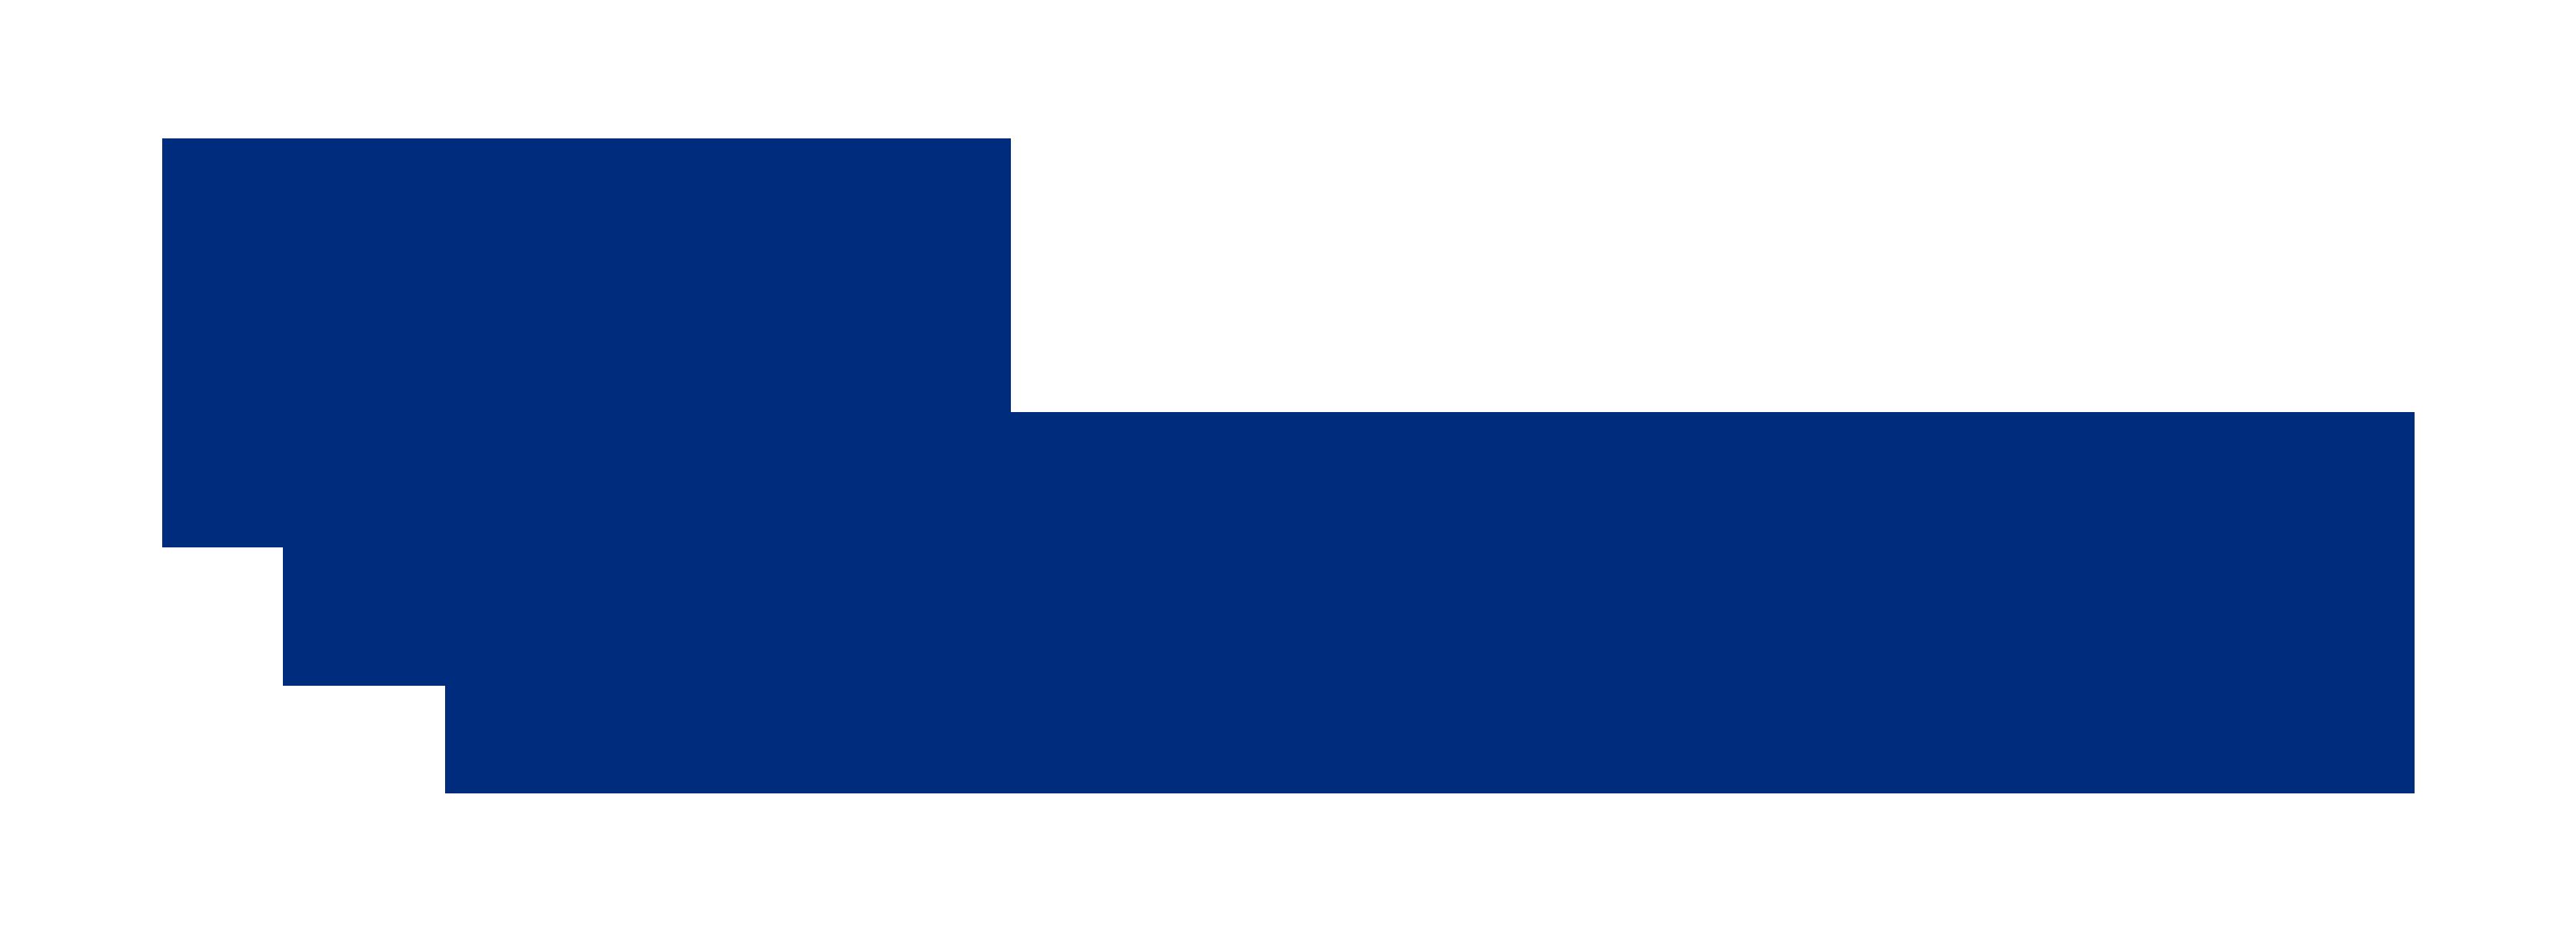 Visa-pay-wave